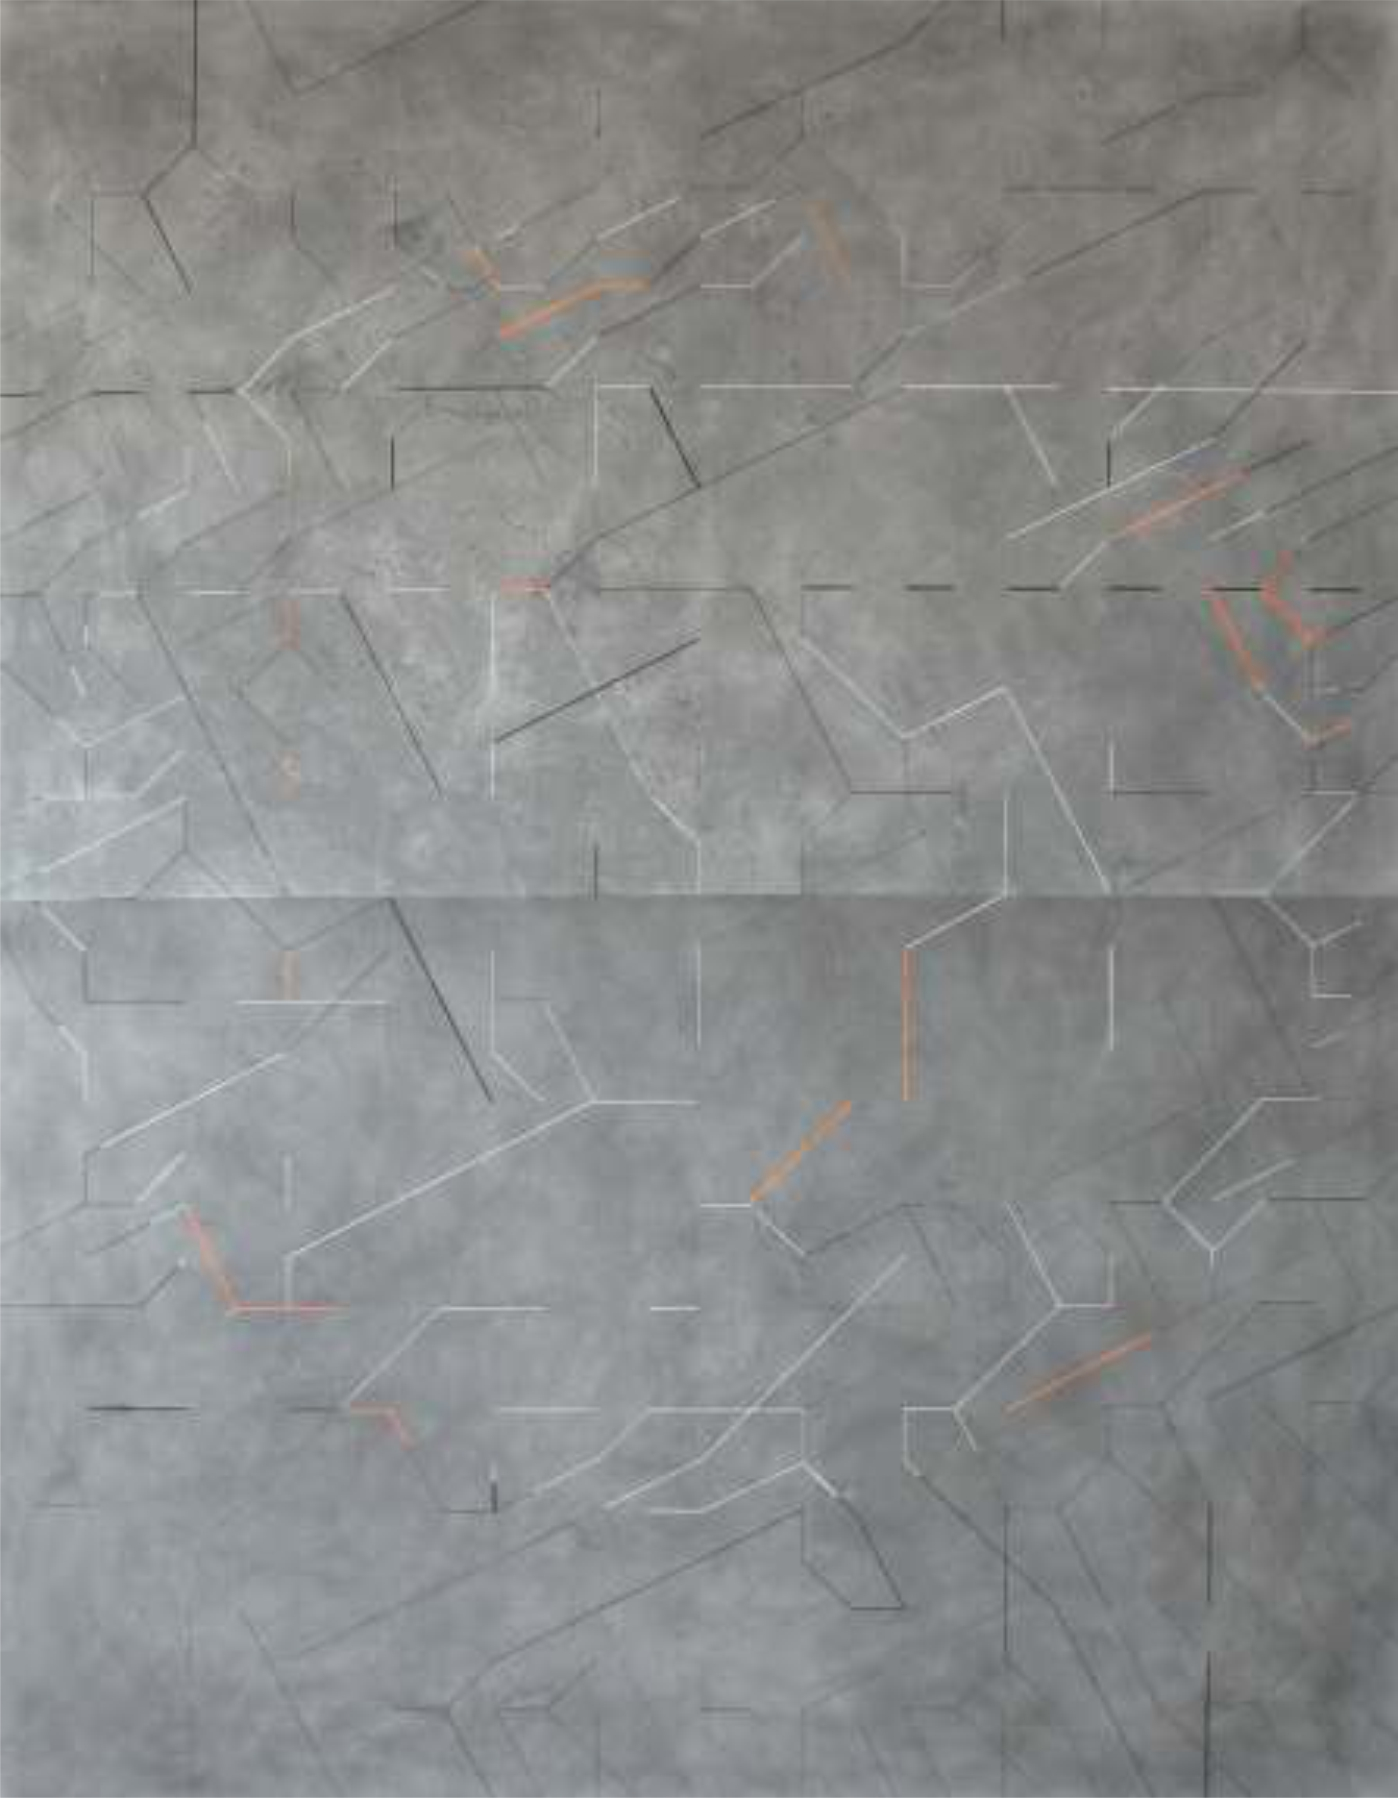 cosmografía 1 140x180 cm. Técnica mixta sobre tela.